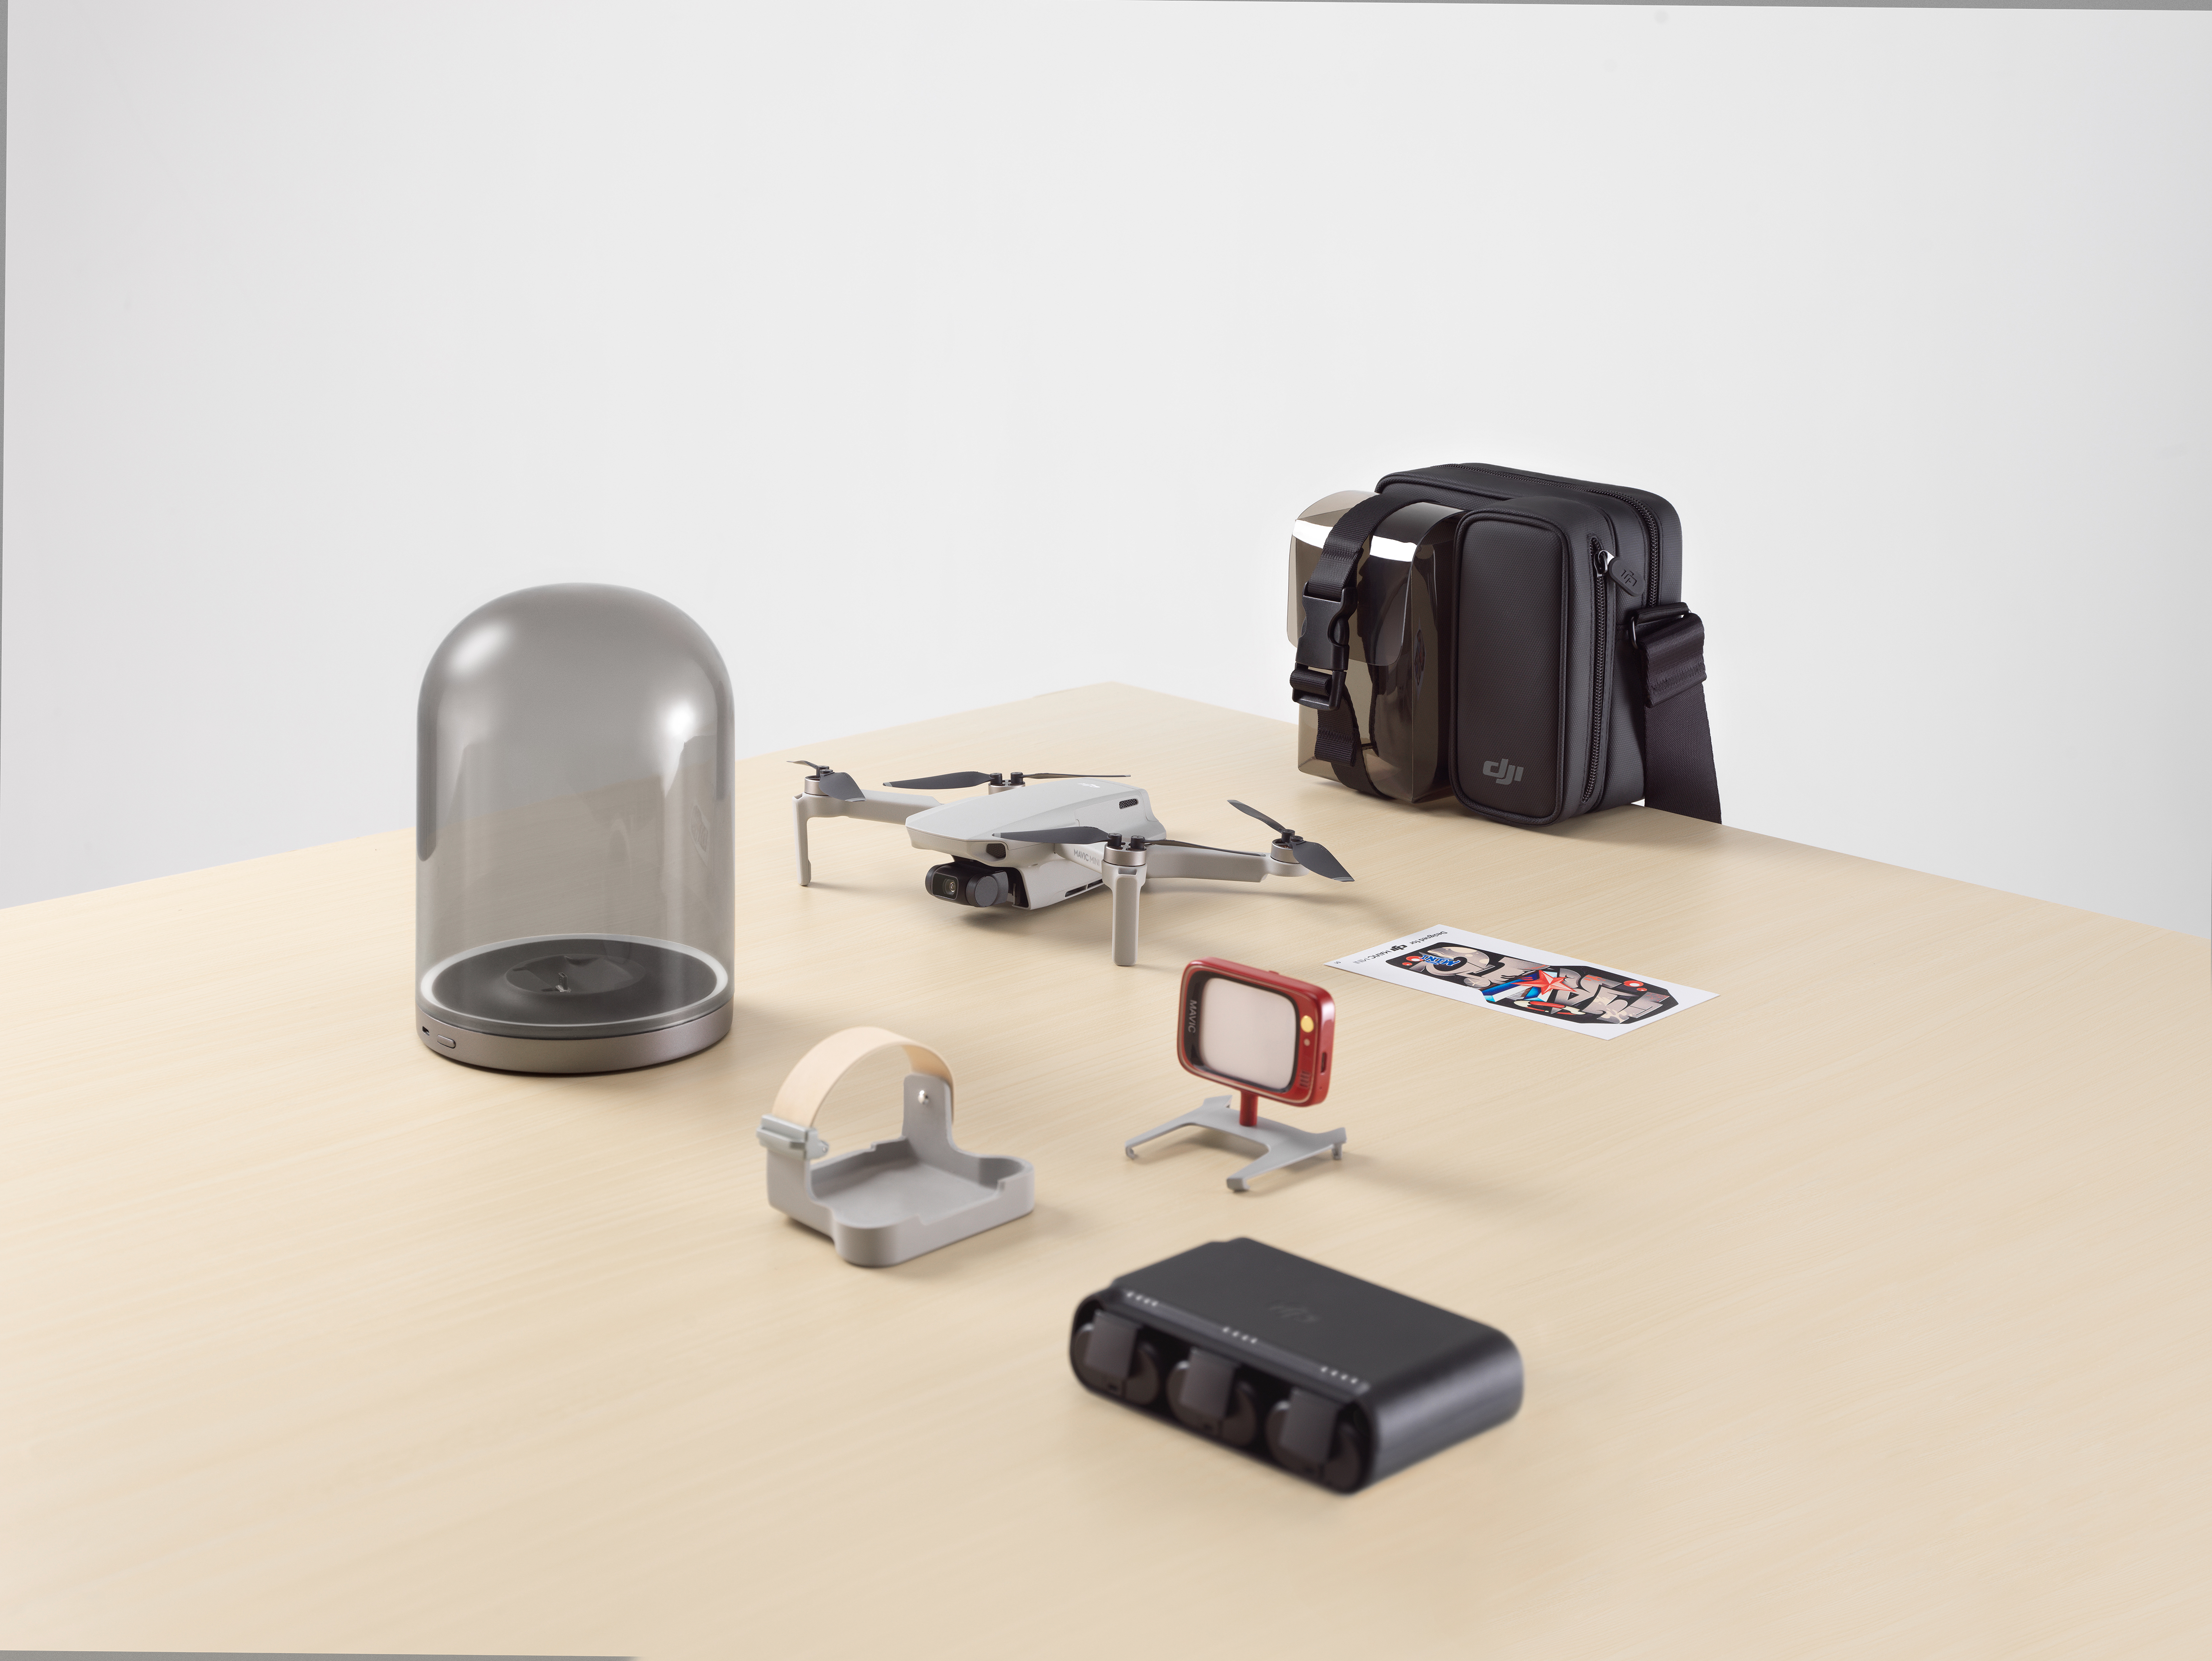 Mavic Mini accesories